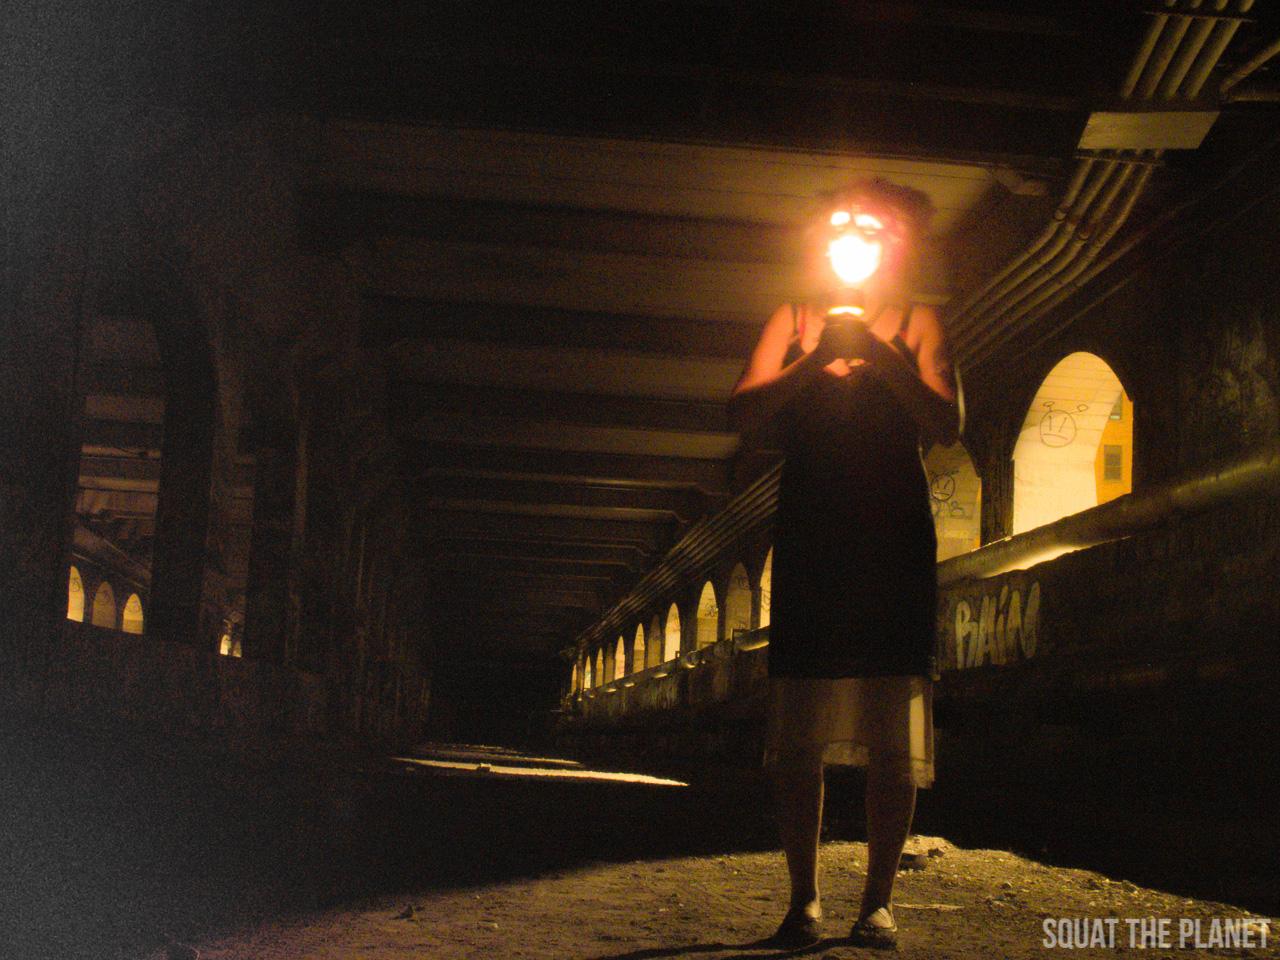 headonfire-jpg.10975_Selkirk - Rochester - Buffalo - Cleveland - Selkirk_Travel Stories_Squat the Planet_3:21 PM